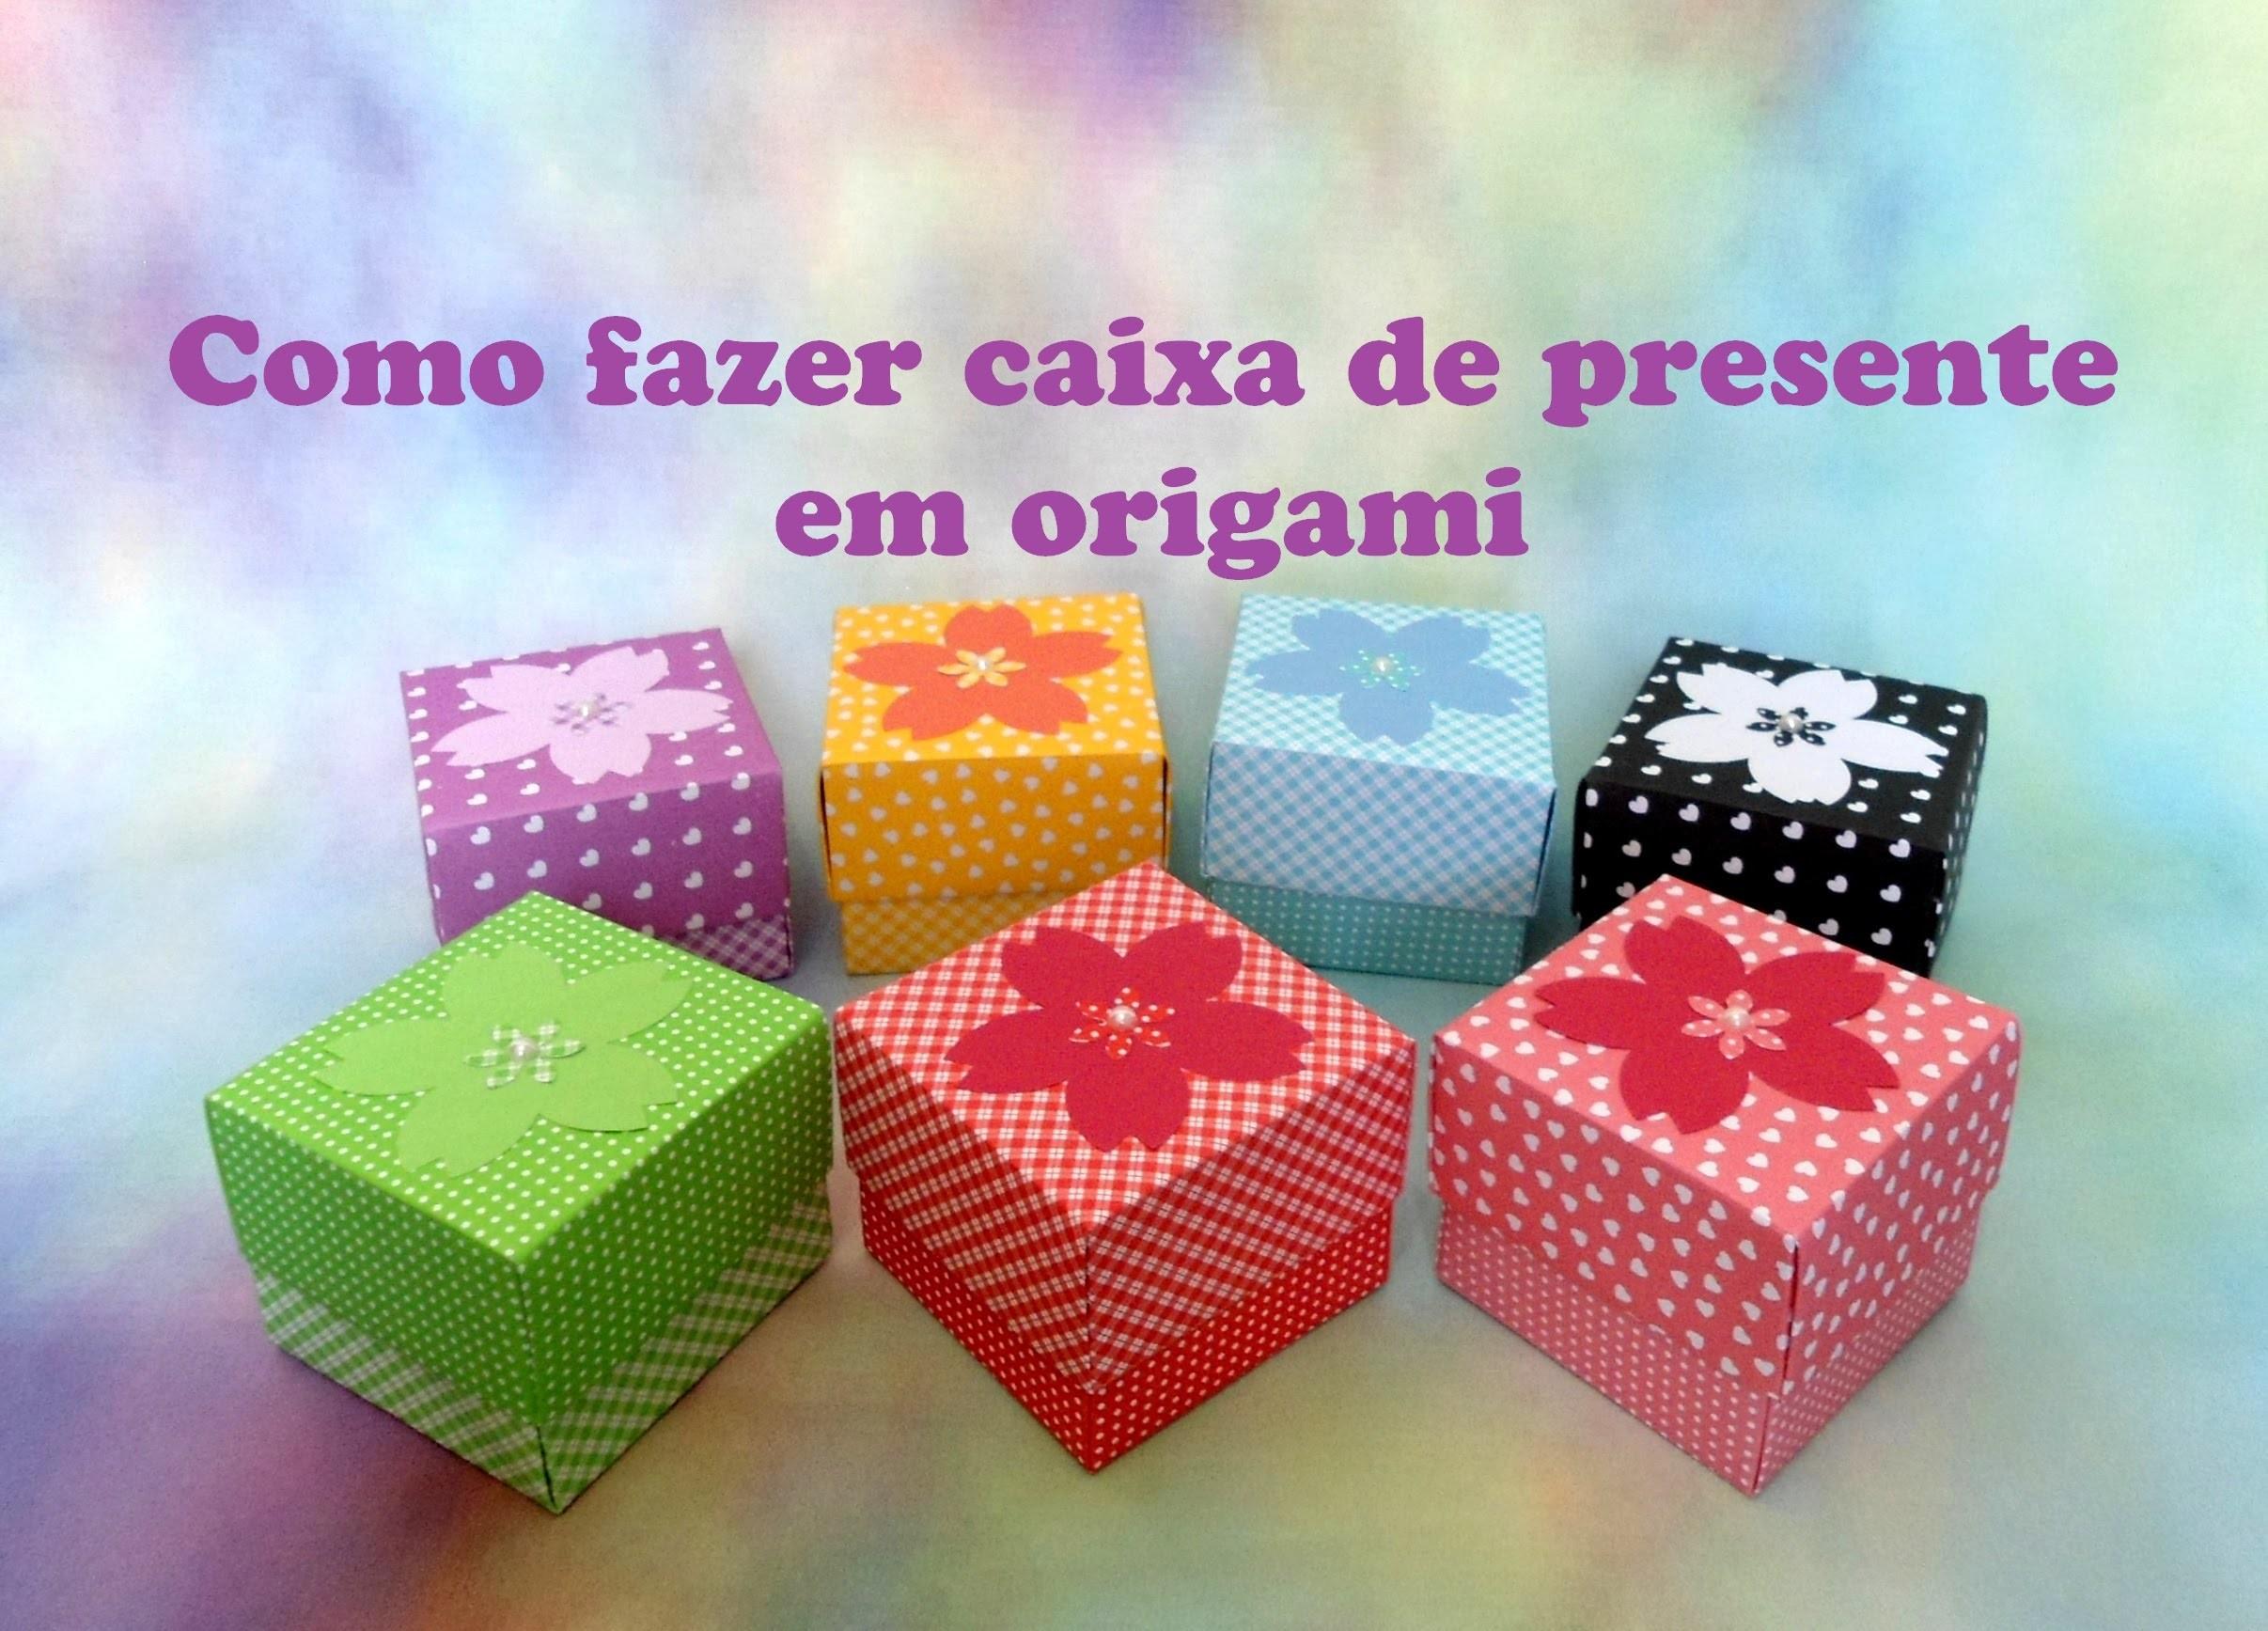 COMO FAZER CAIXA DE PRESENTE DE ORIGAMI My Crafts and DIY Projects #446D18 2413x1735